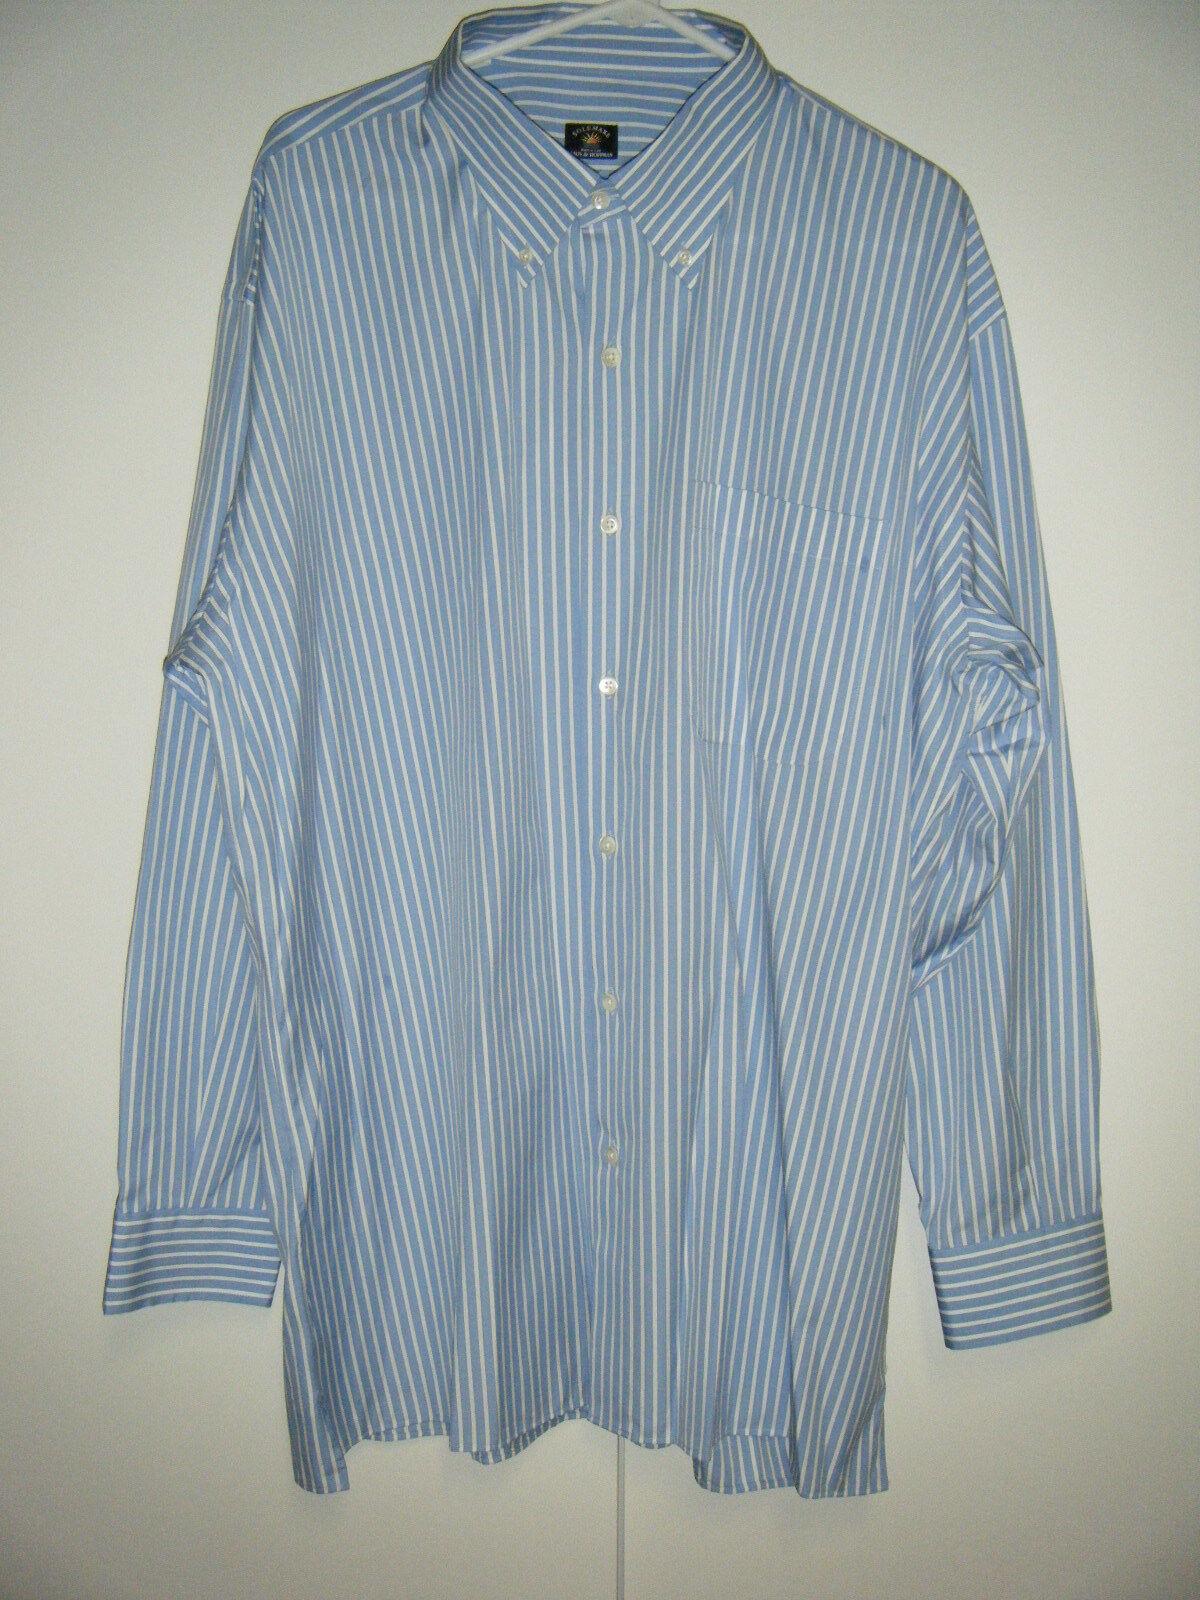 Herren MADE IN ITALY LONG SLEEVE 100% COTTON DRESS SHIRT 2XL NEW Blau & Weiß